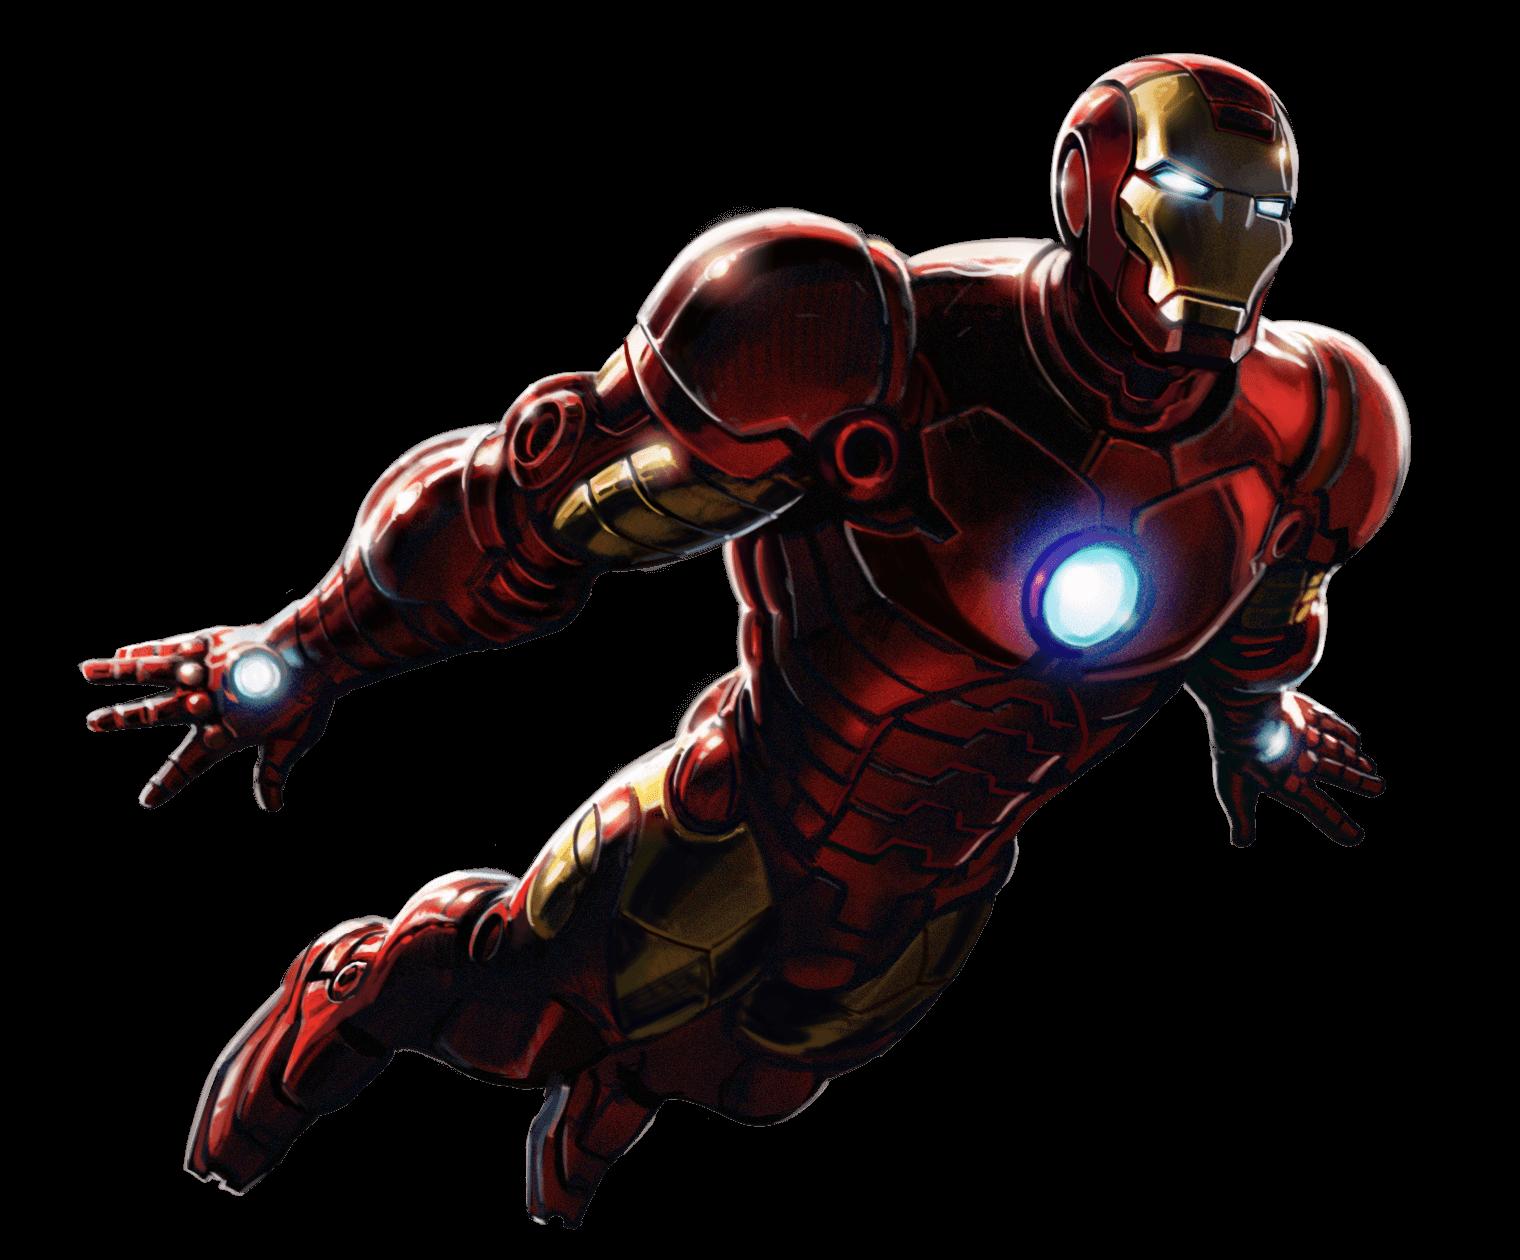 9800 Gambar Iron Man Png HD Terbaik